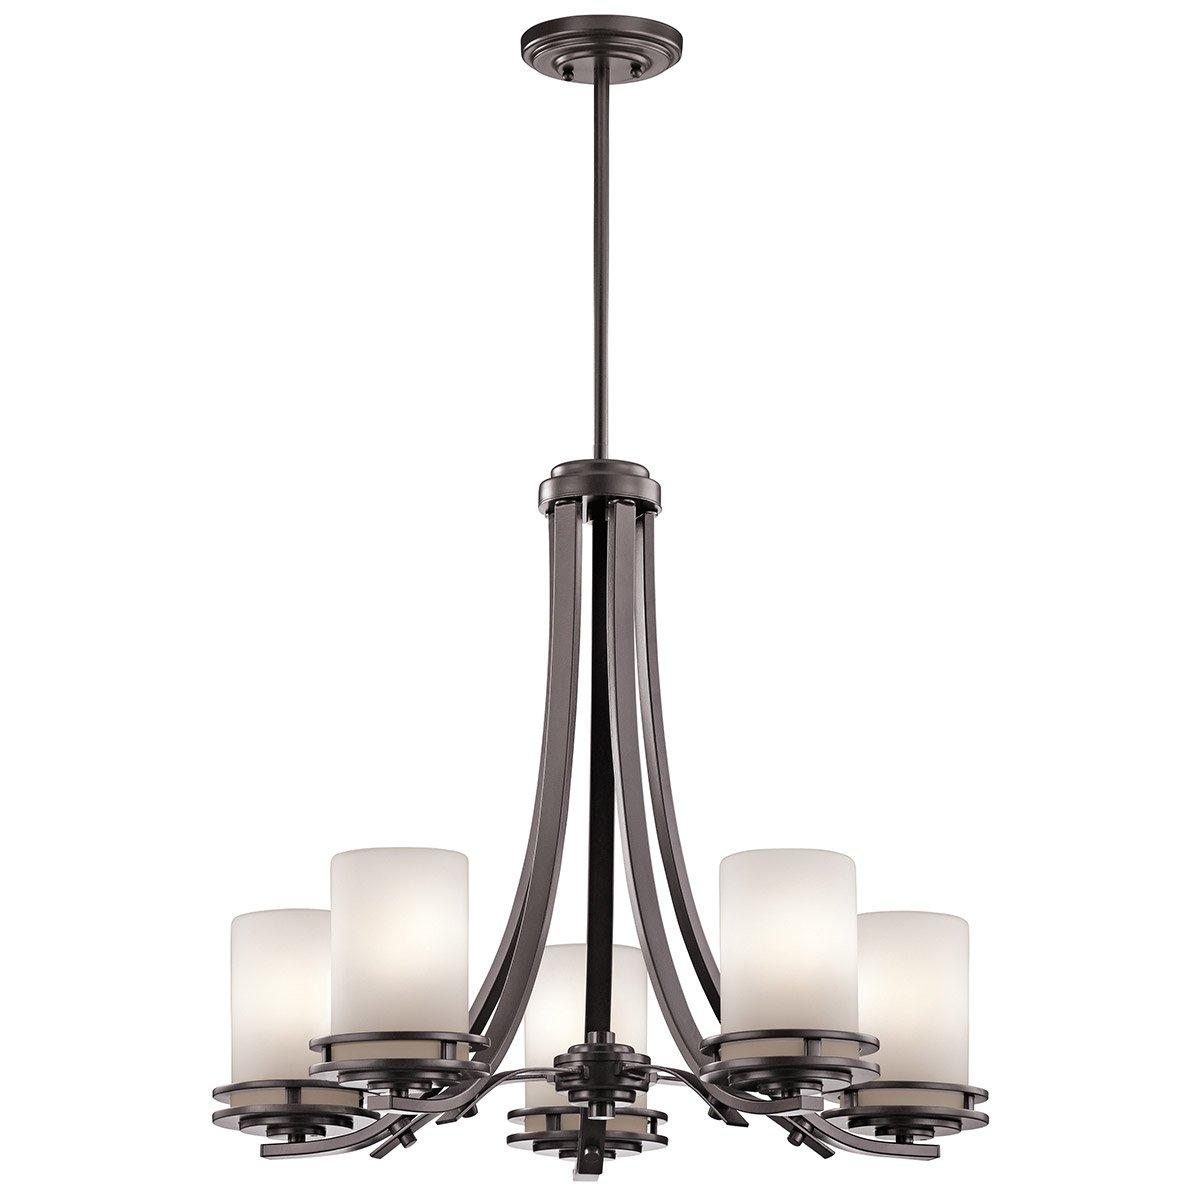 Kichler Lighting 49671Az Hendrik 5 Light 25 Inch Architectural Regarding Outdoor Chandelier Kichler Lighting (#6 of 15)